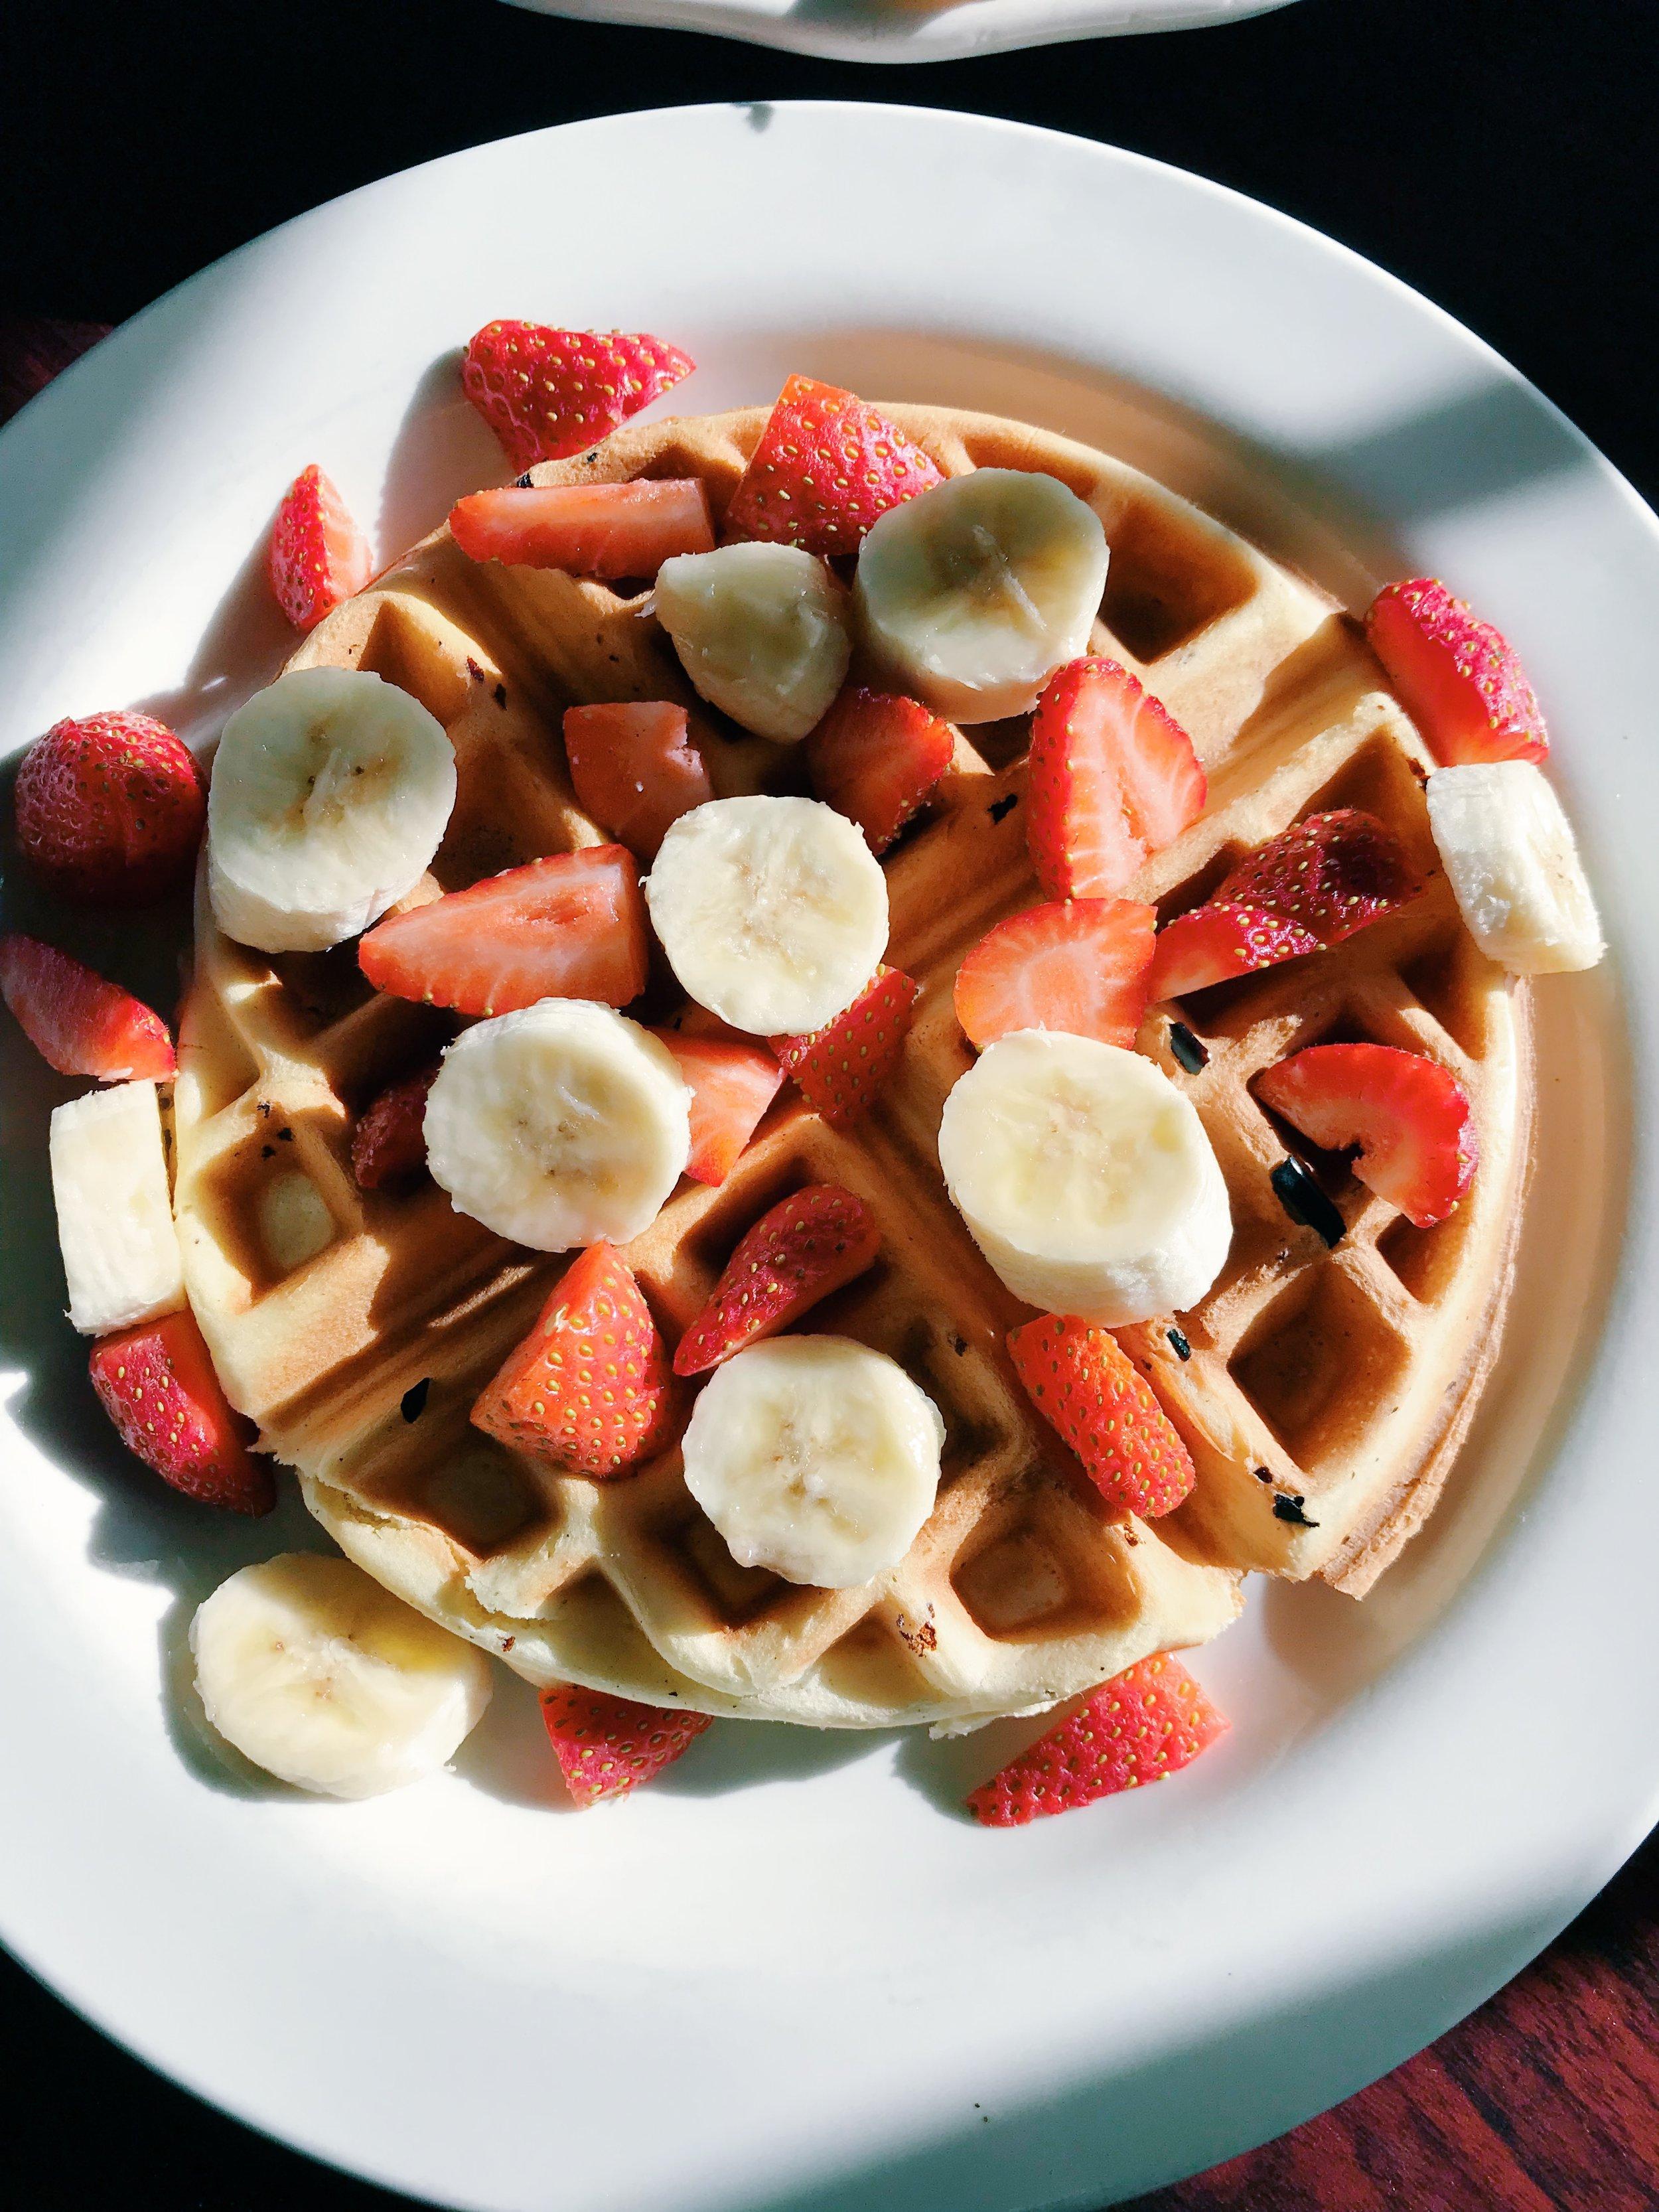 Best Homemade Waffle Recipe